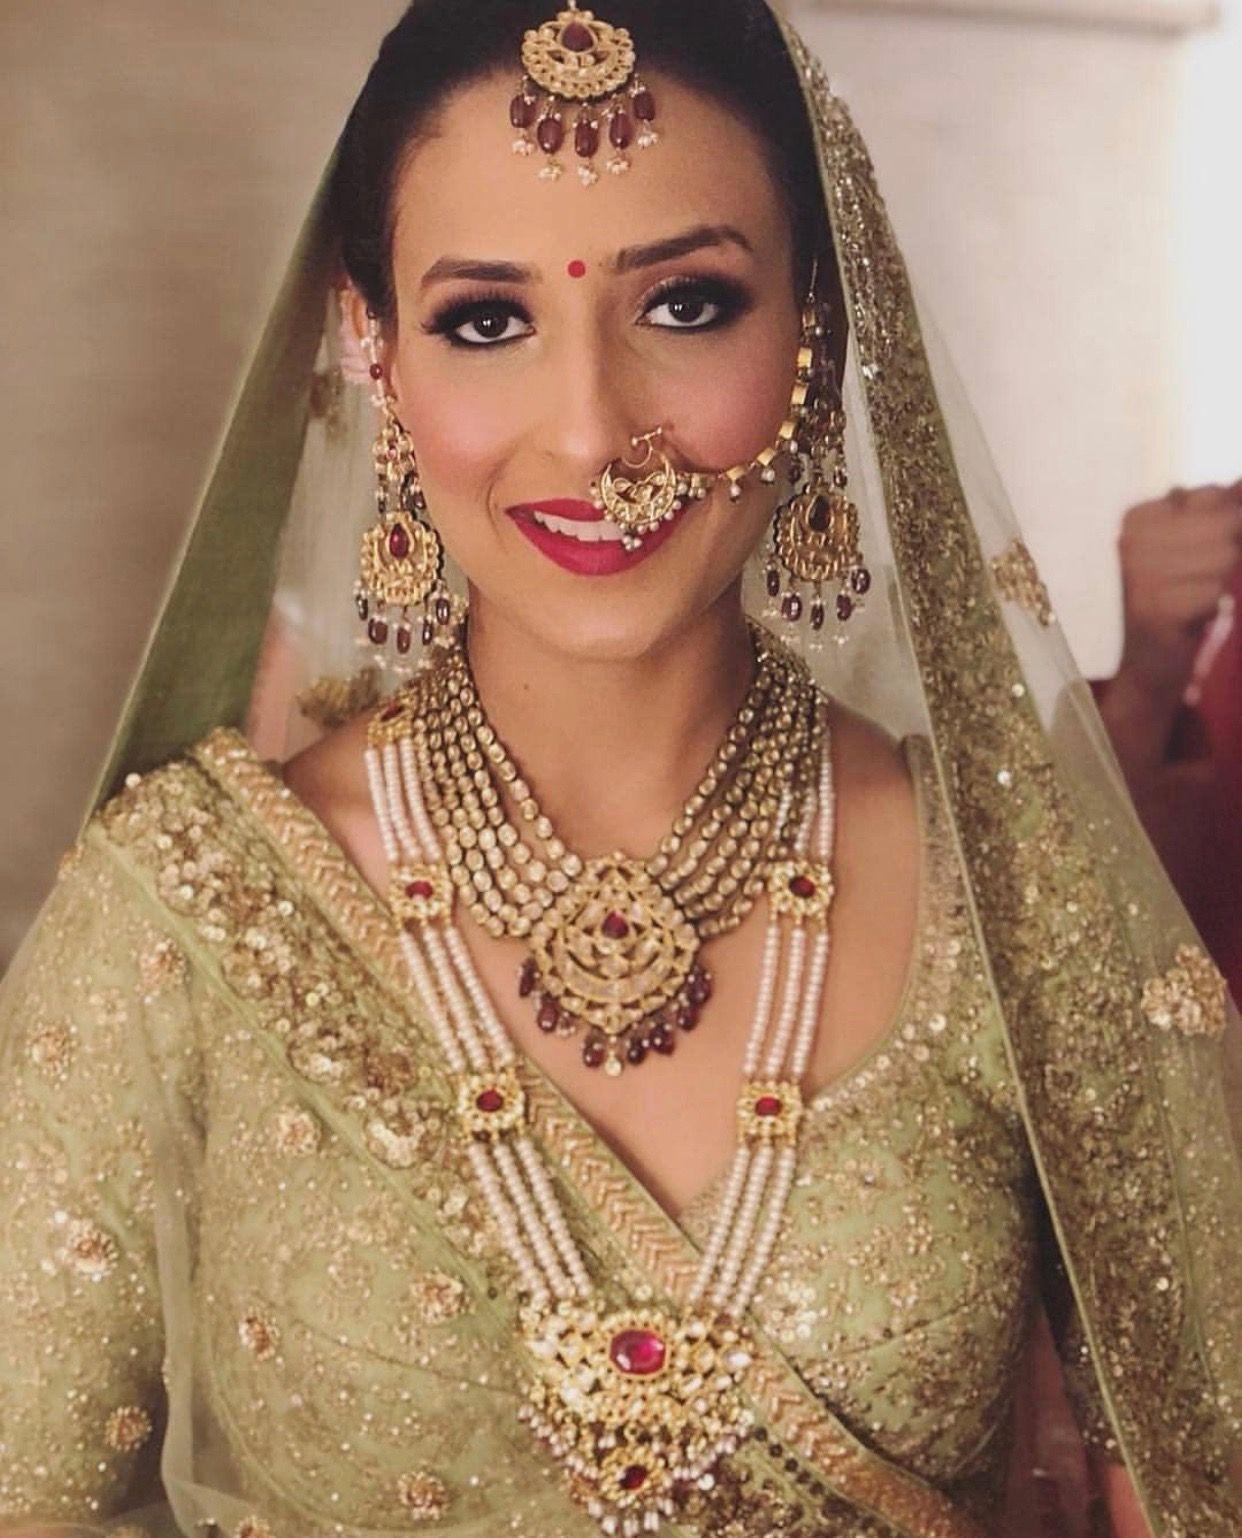 Pin by Bhumika Dubey on Wedding Bridal Inspiration | Indian bride, Bridal  designs, Bridal